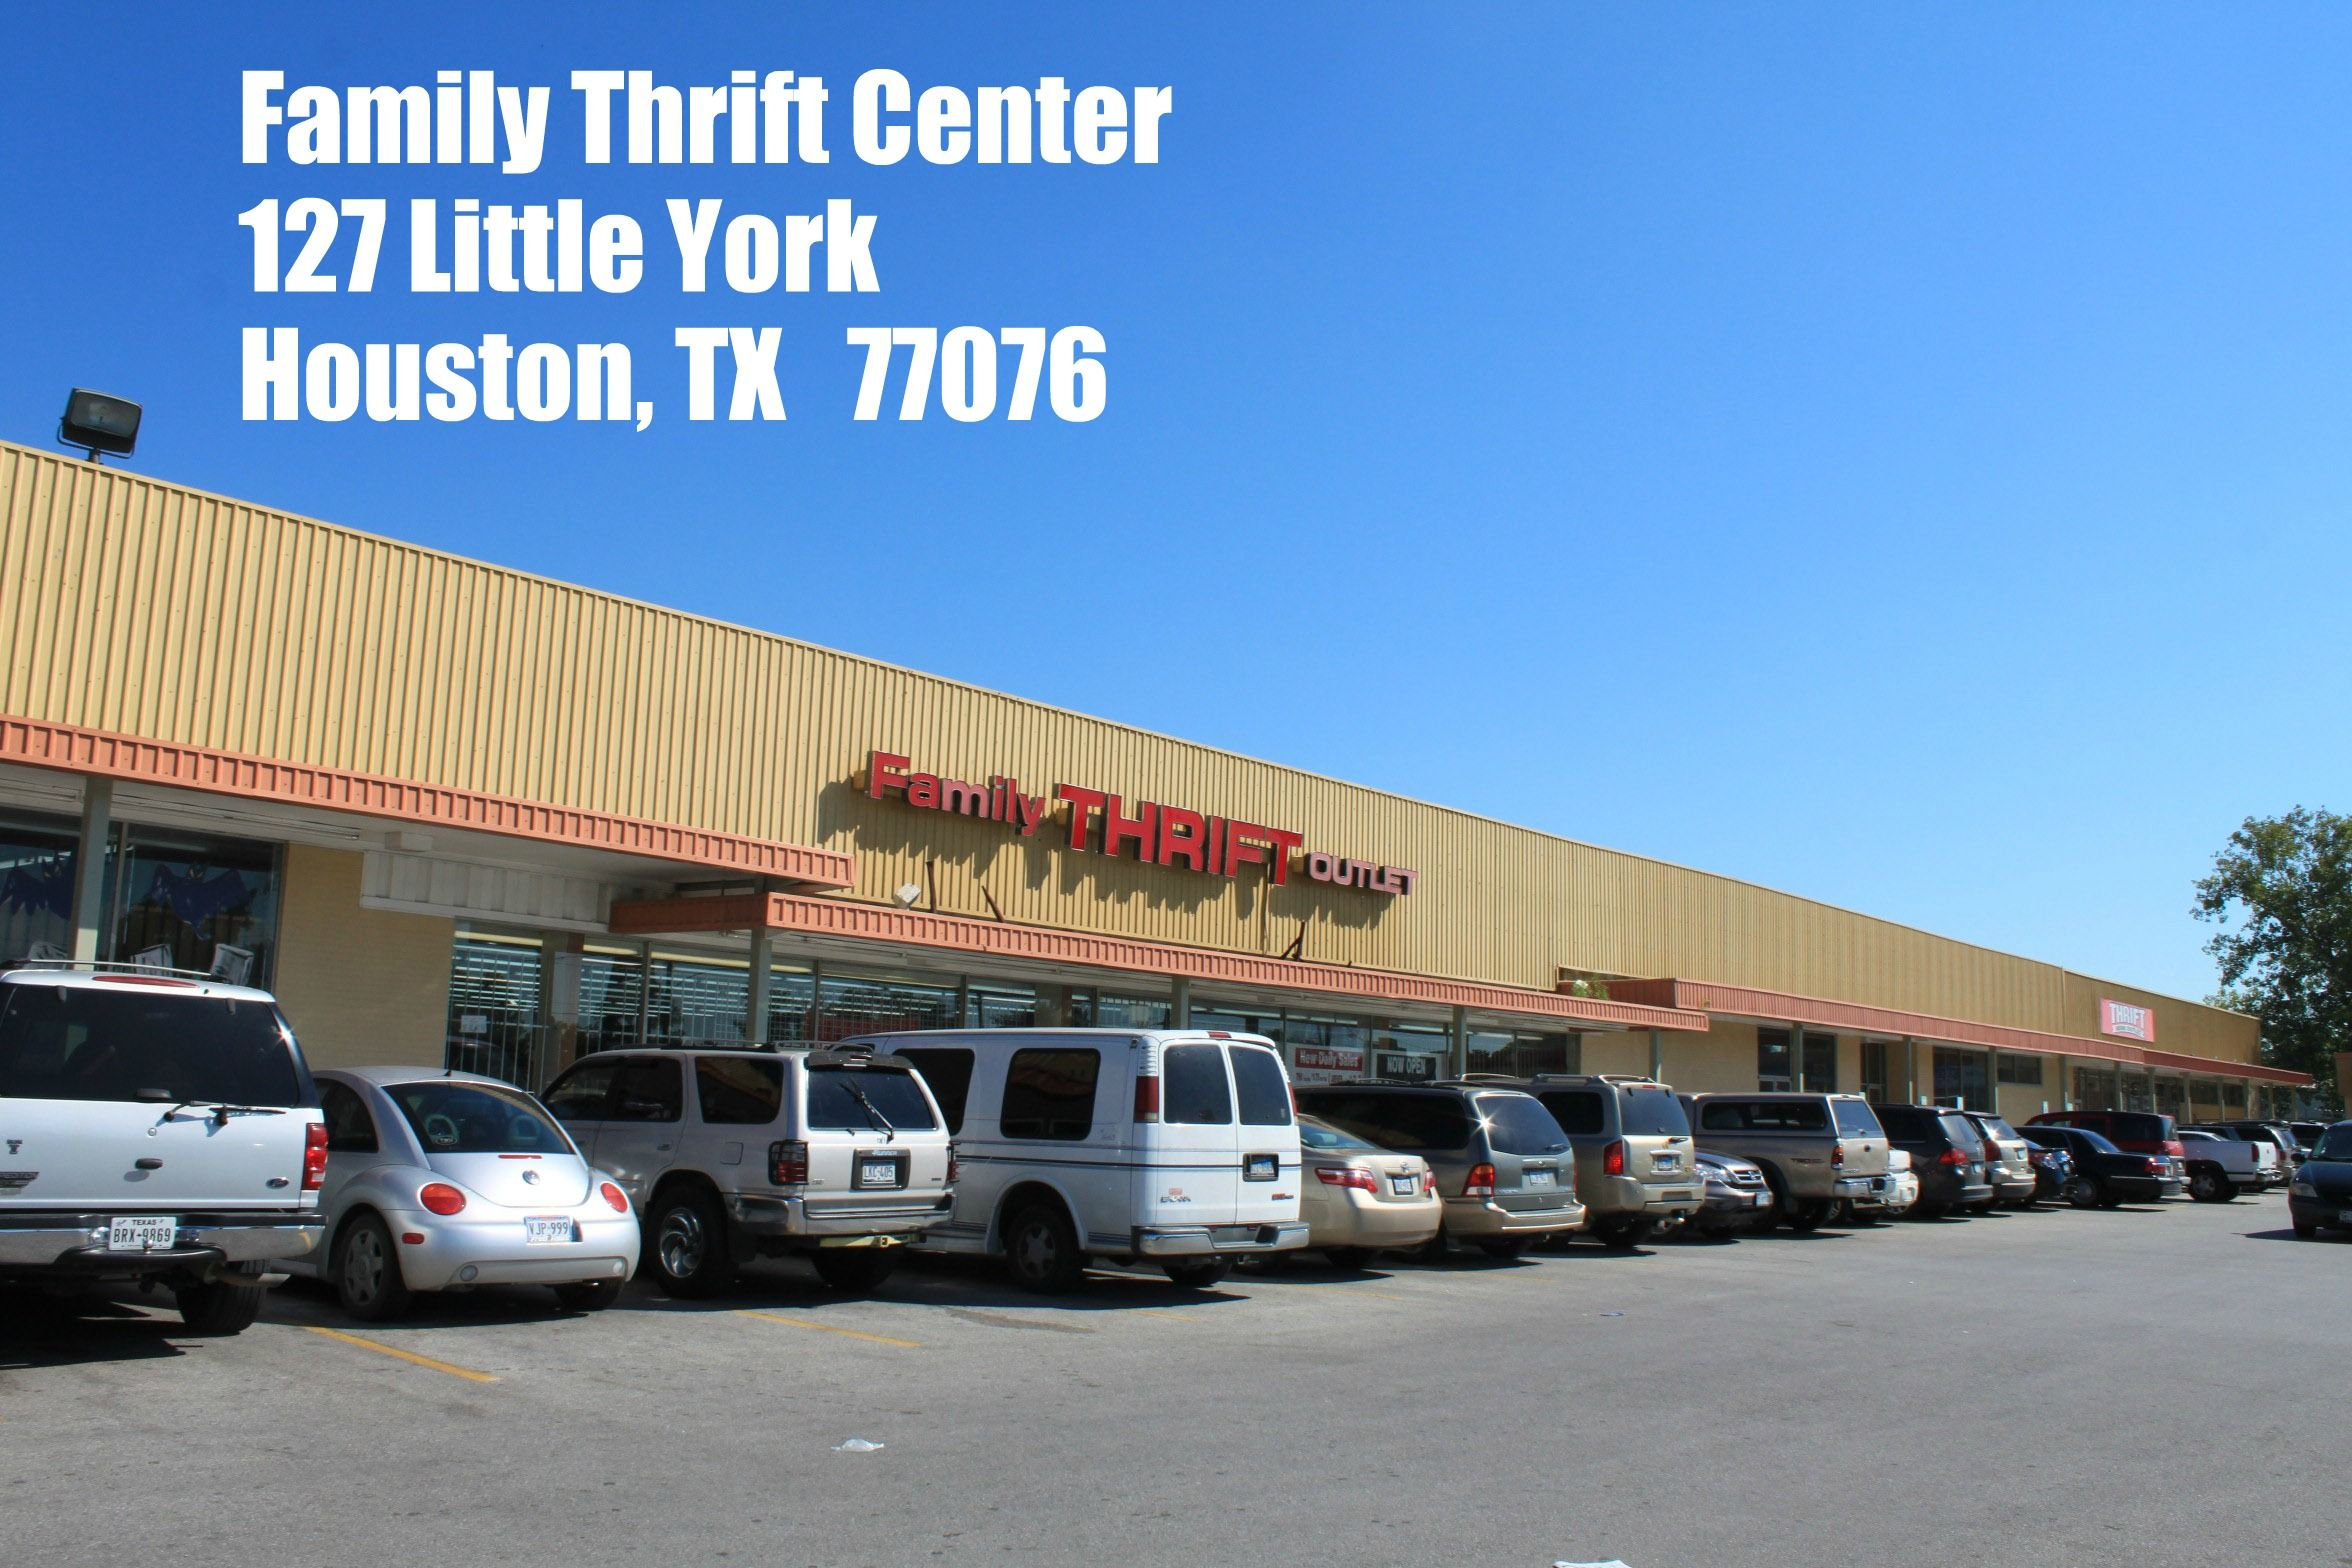 Family Thrift Center Outlet Thrifting Thrift Outlet The Neighbourhood